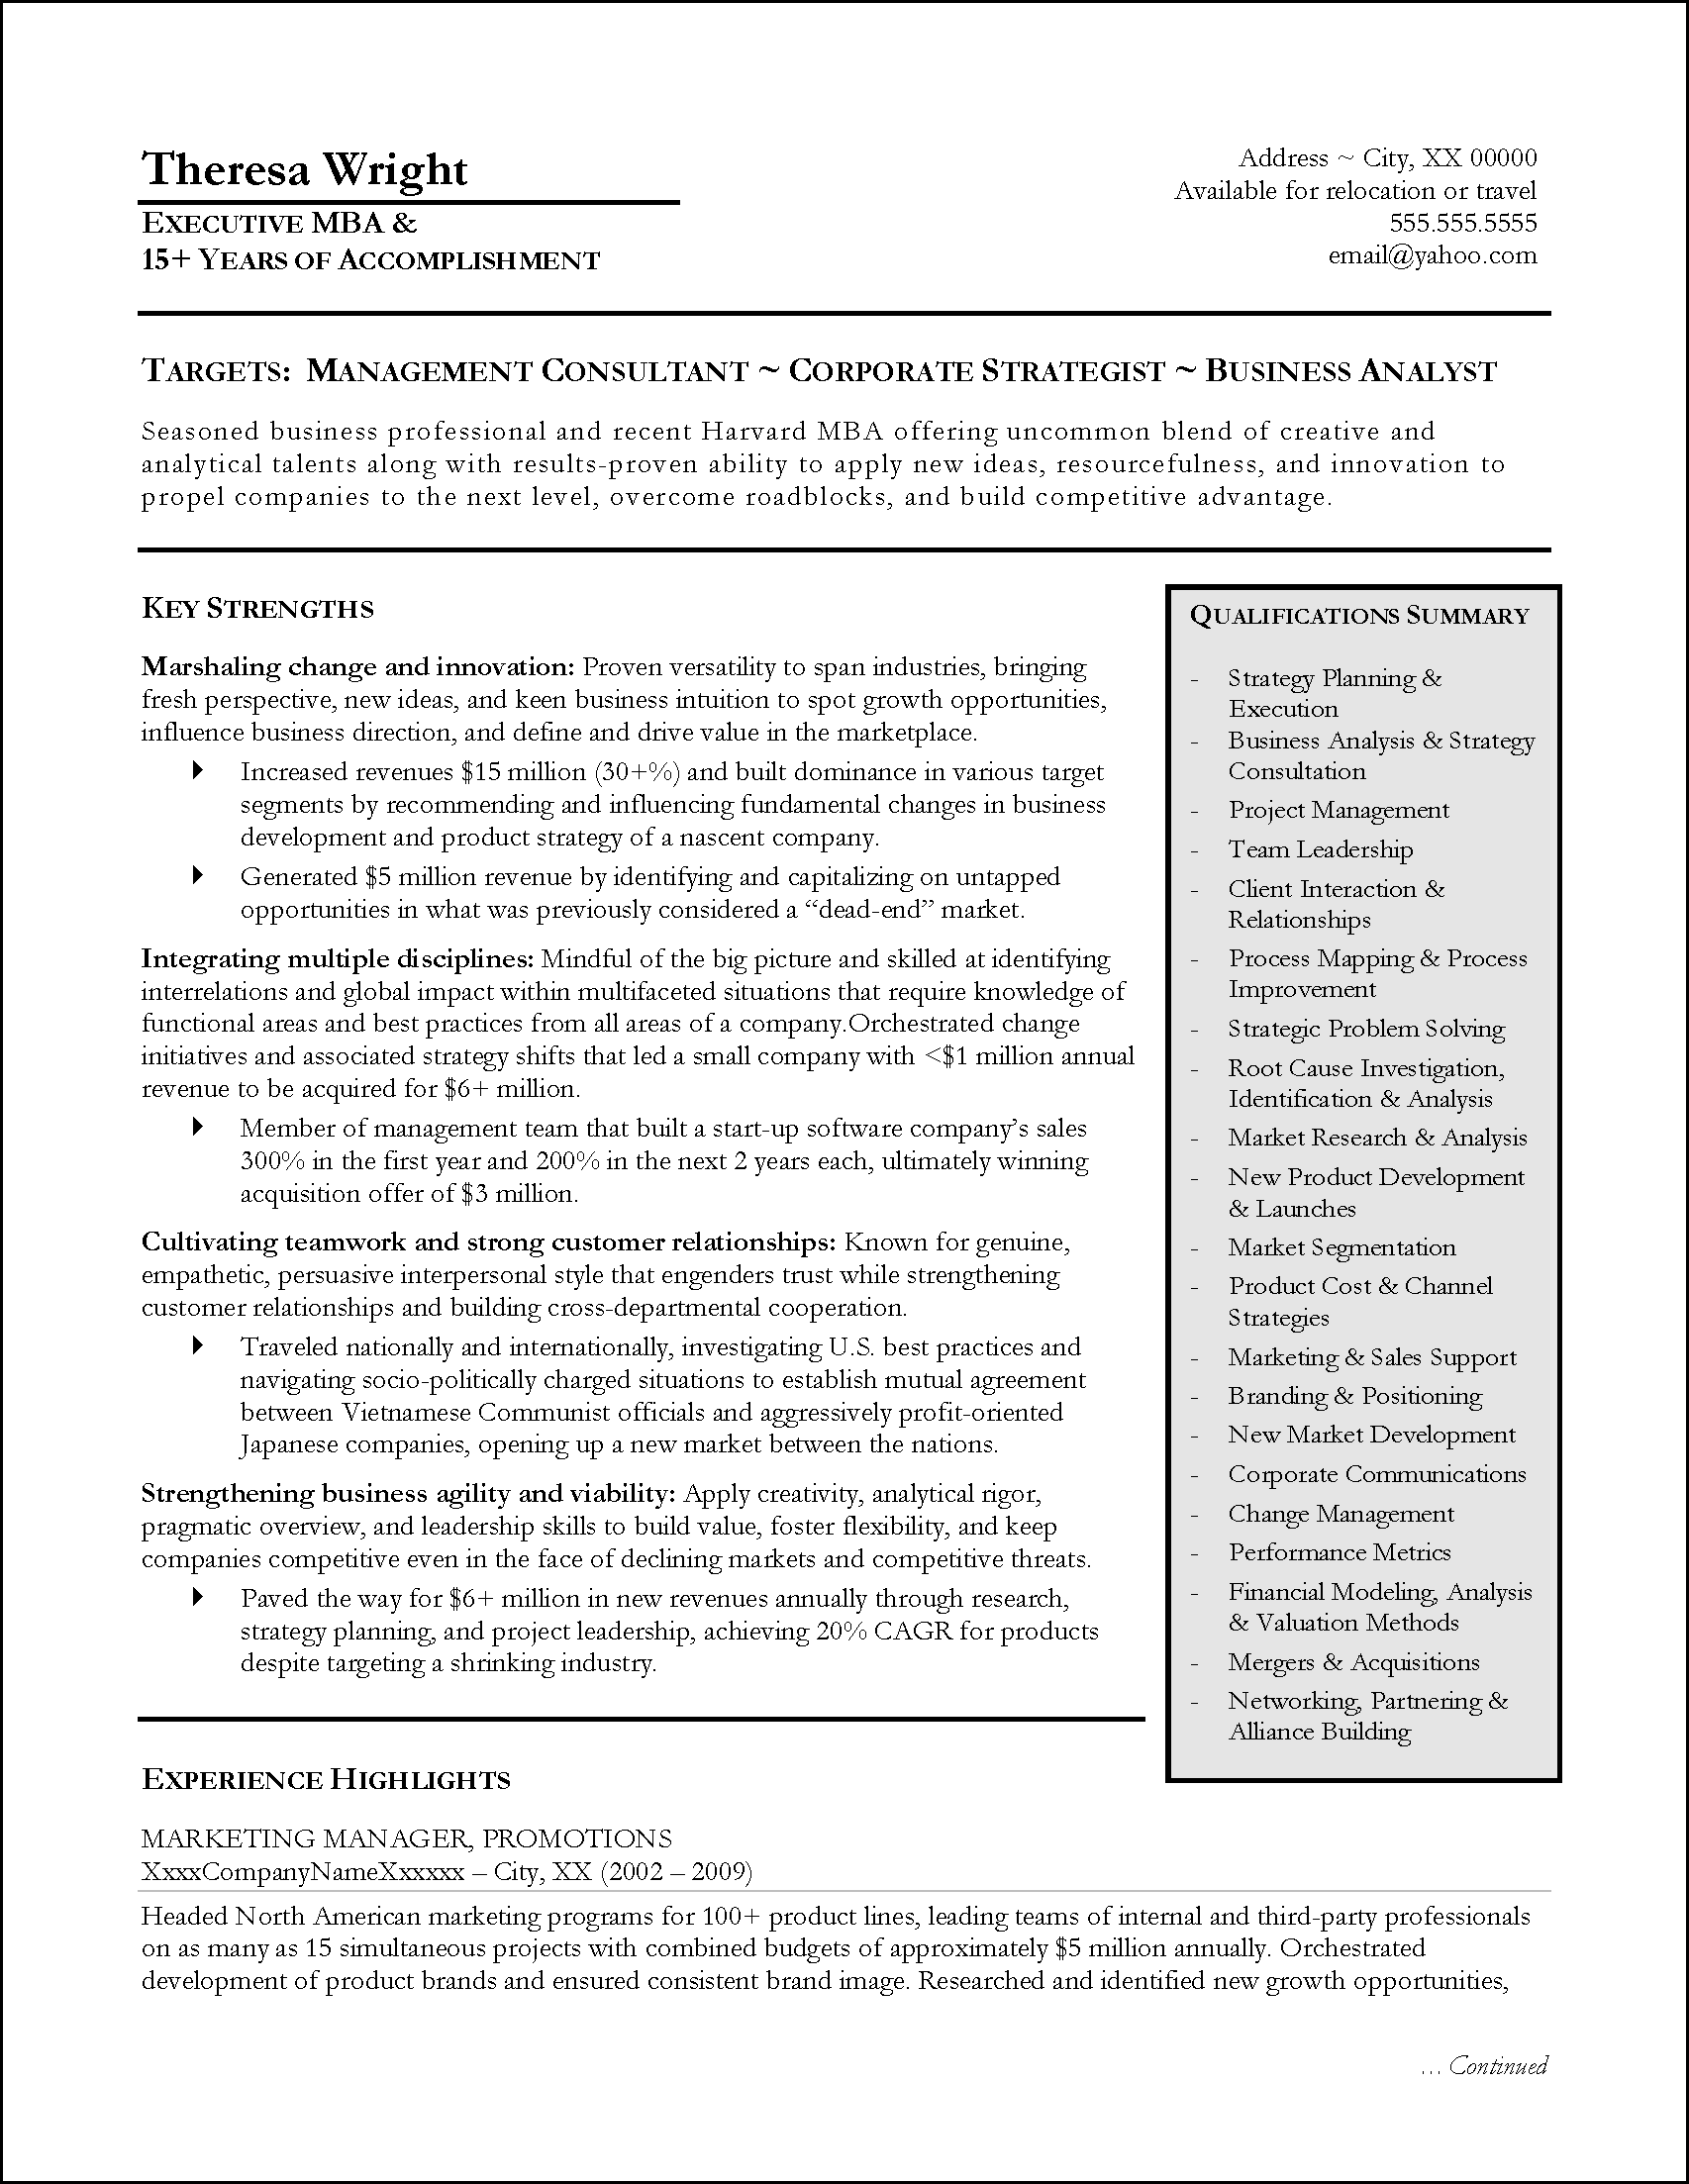 VIP Resume6 Gray Page 1